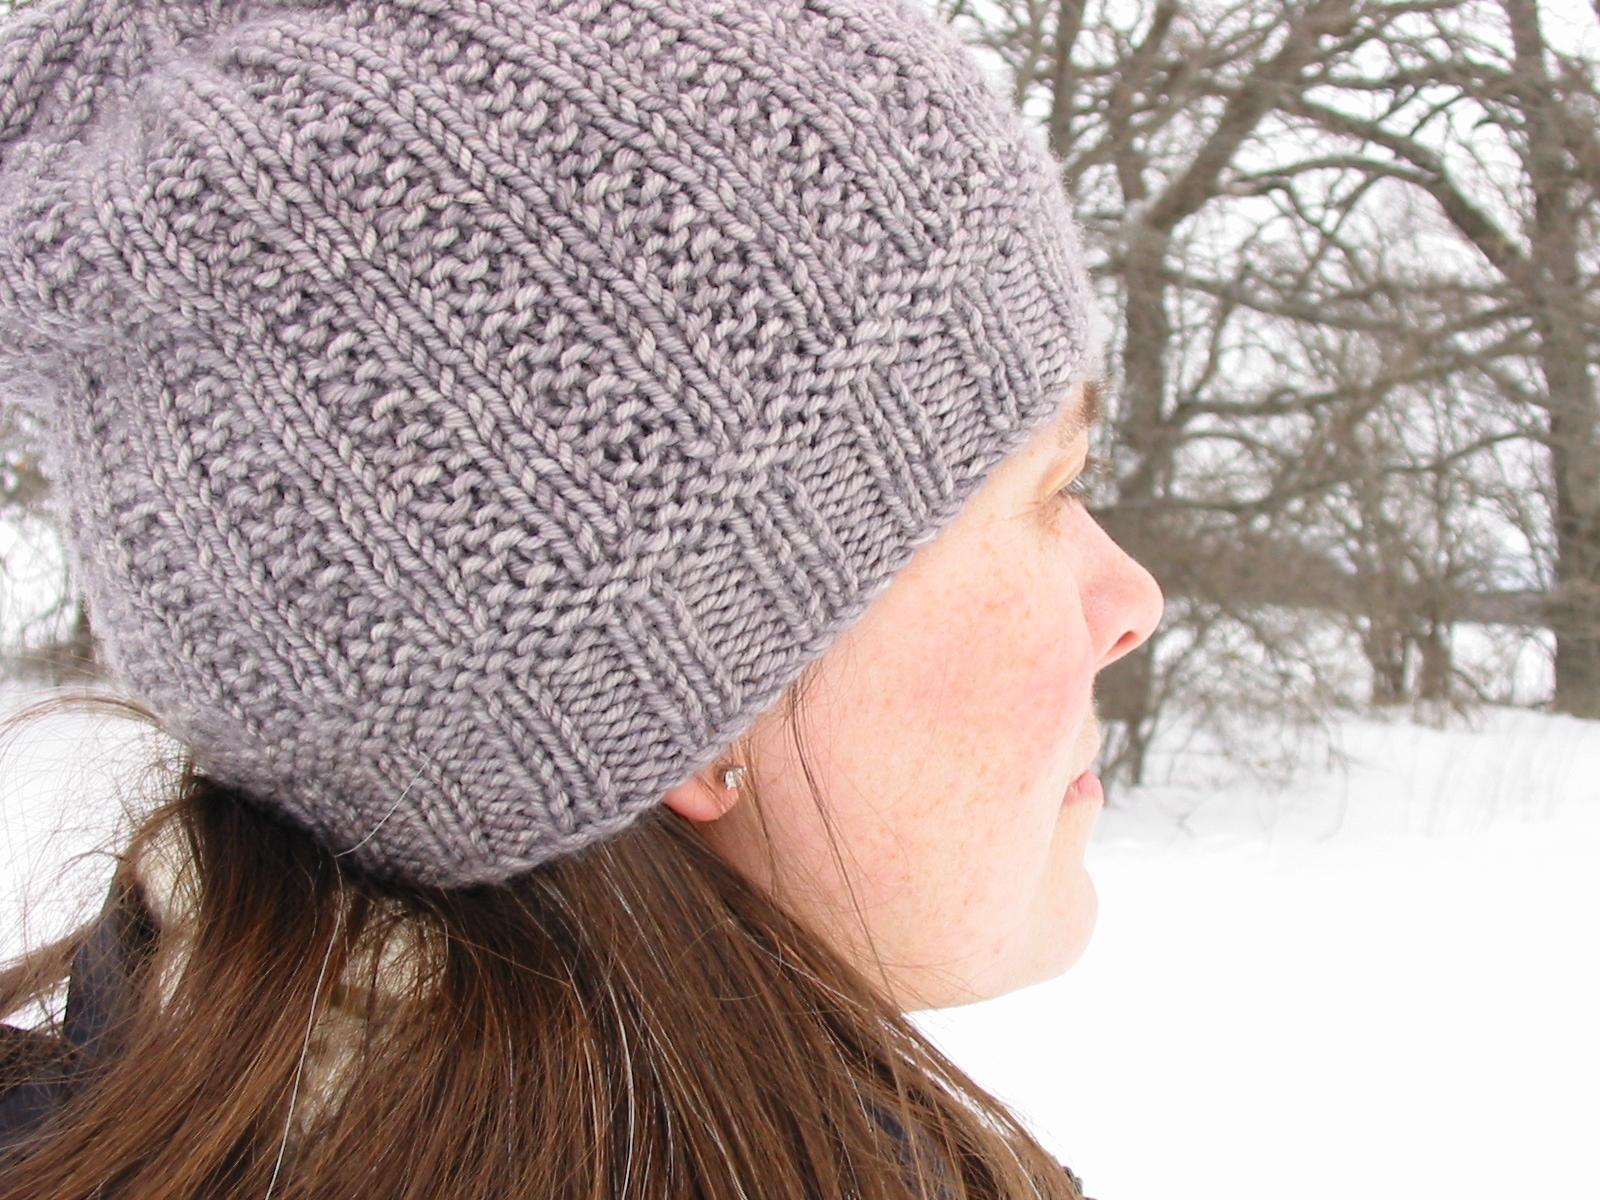 Knit Jane Knit: Two New Hat Patterns